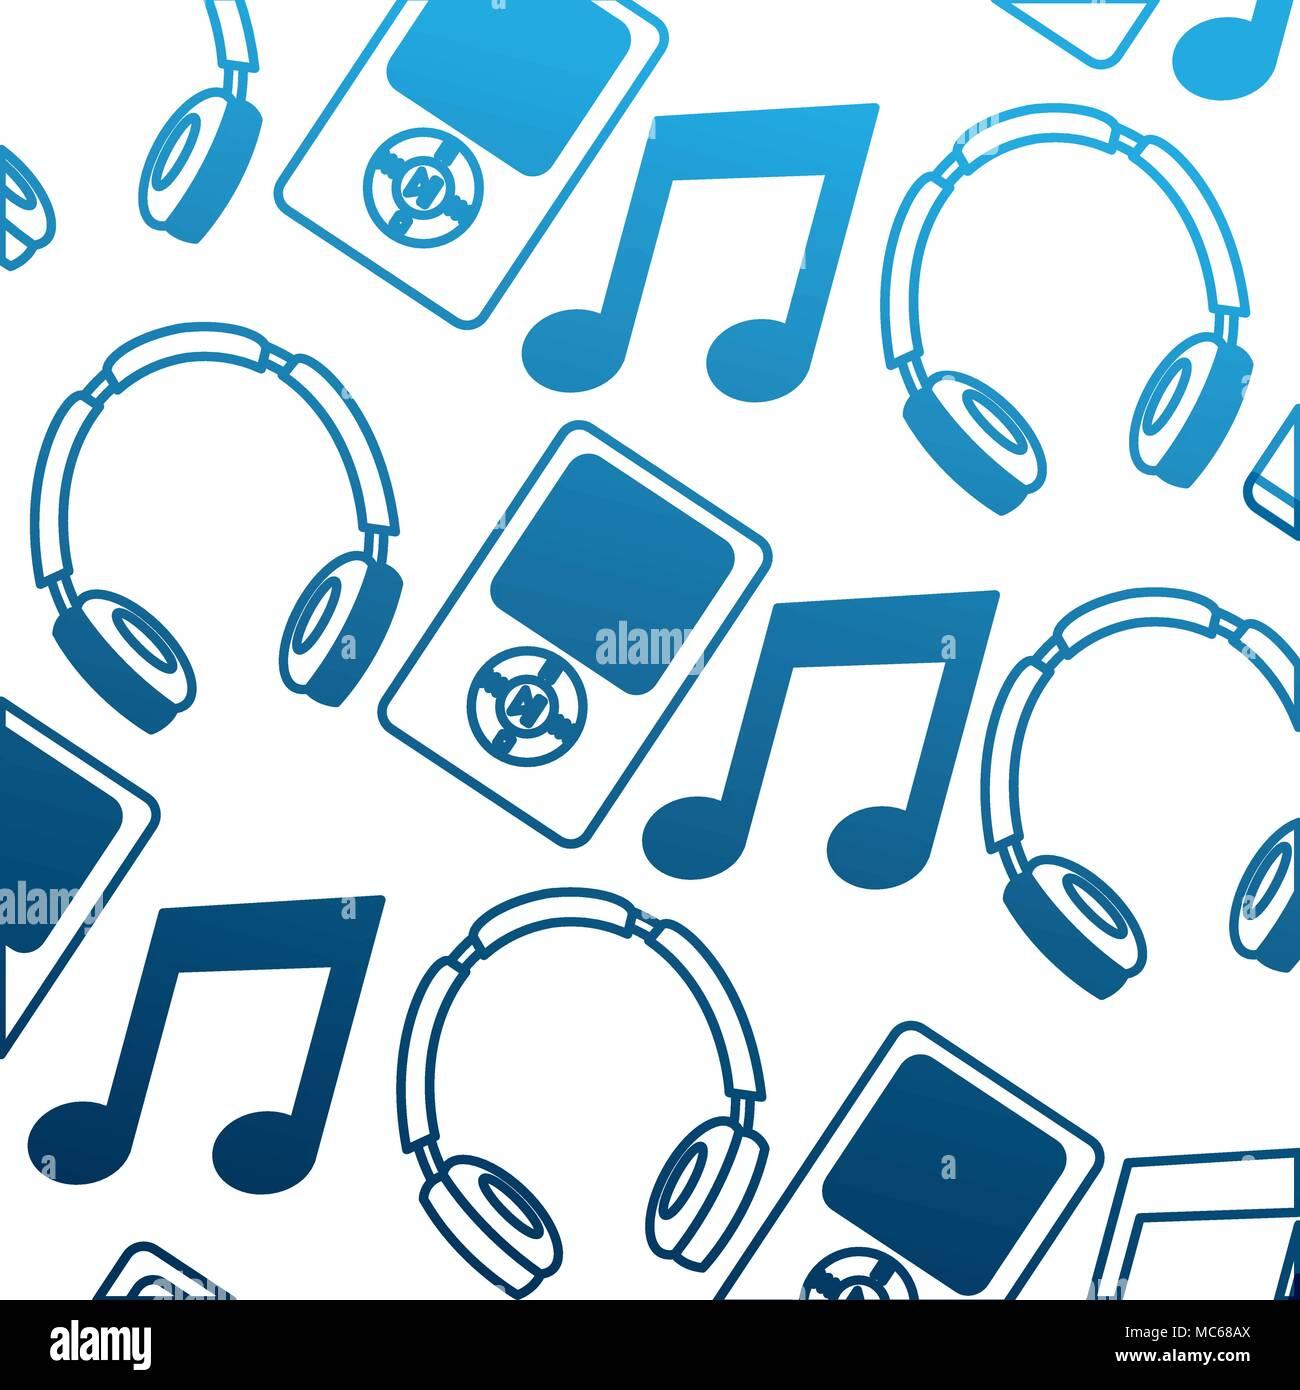 social media mp3 headphones music note pattern Stock Vector